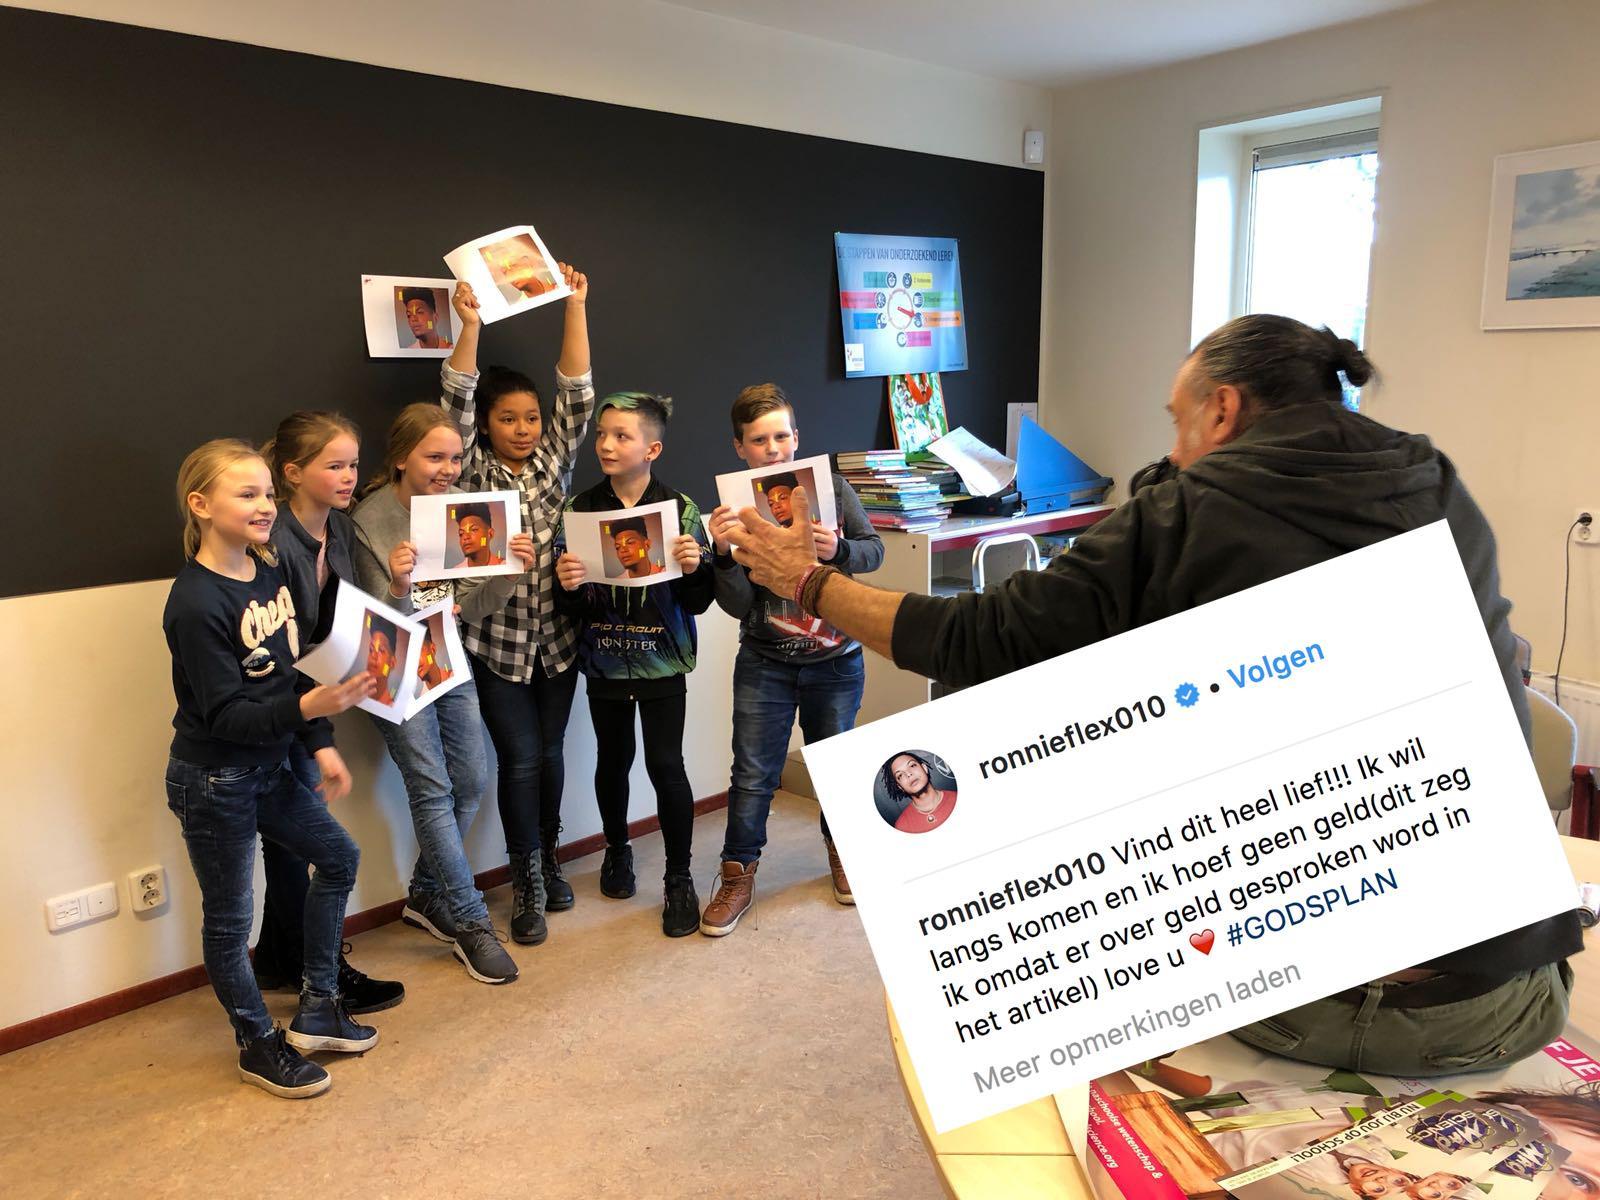 Rapper Ronnie Flex komt gráág naar De Harpoen in Jisp